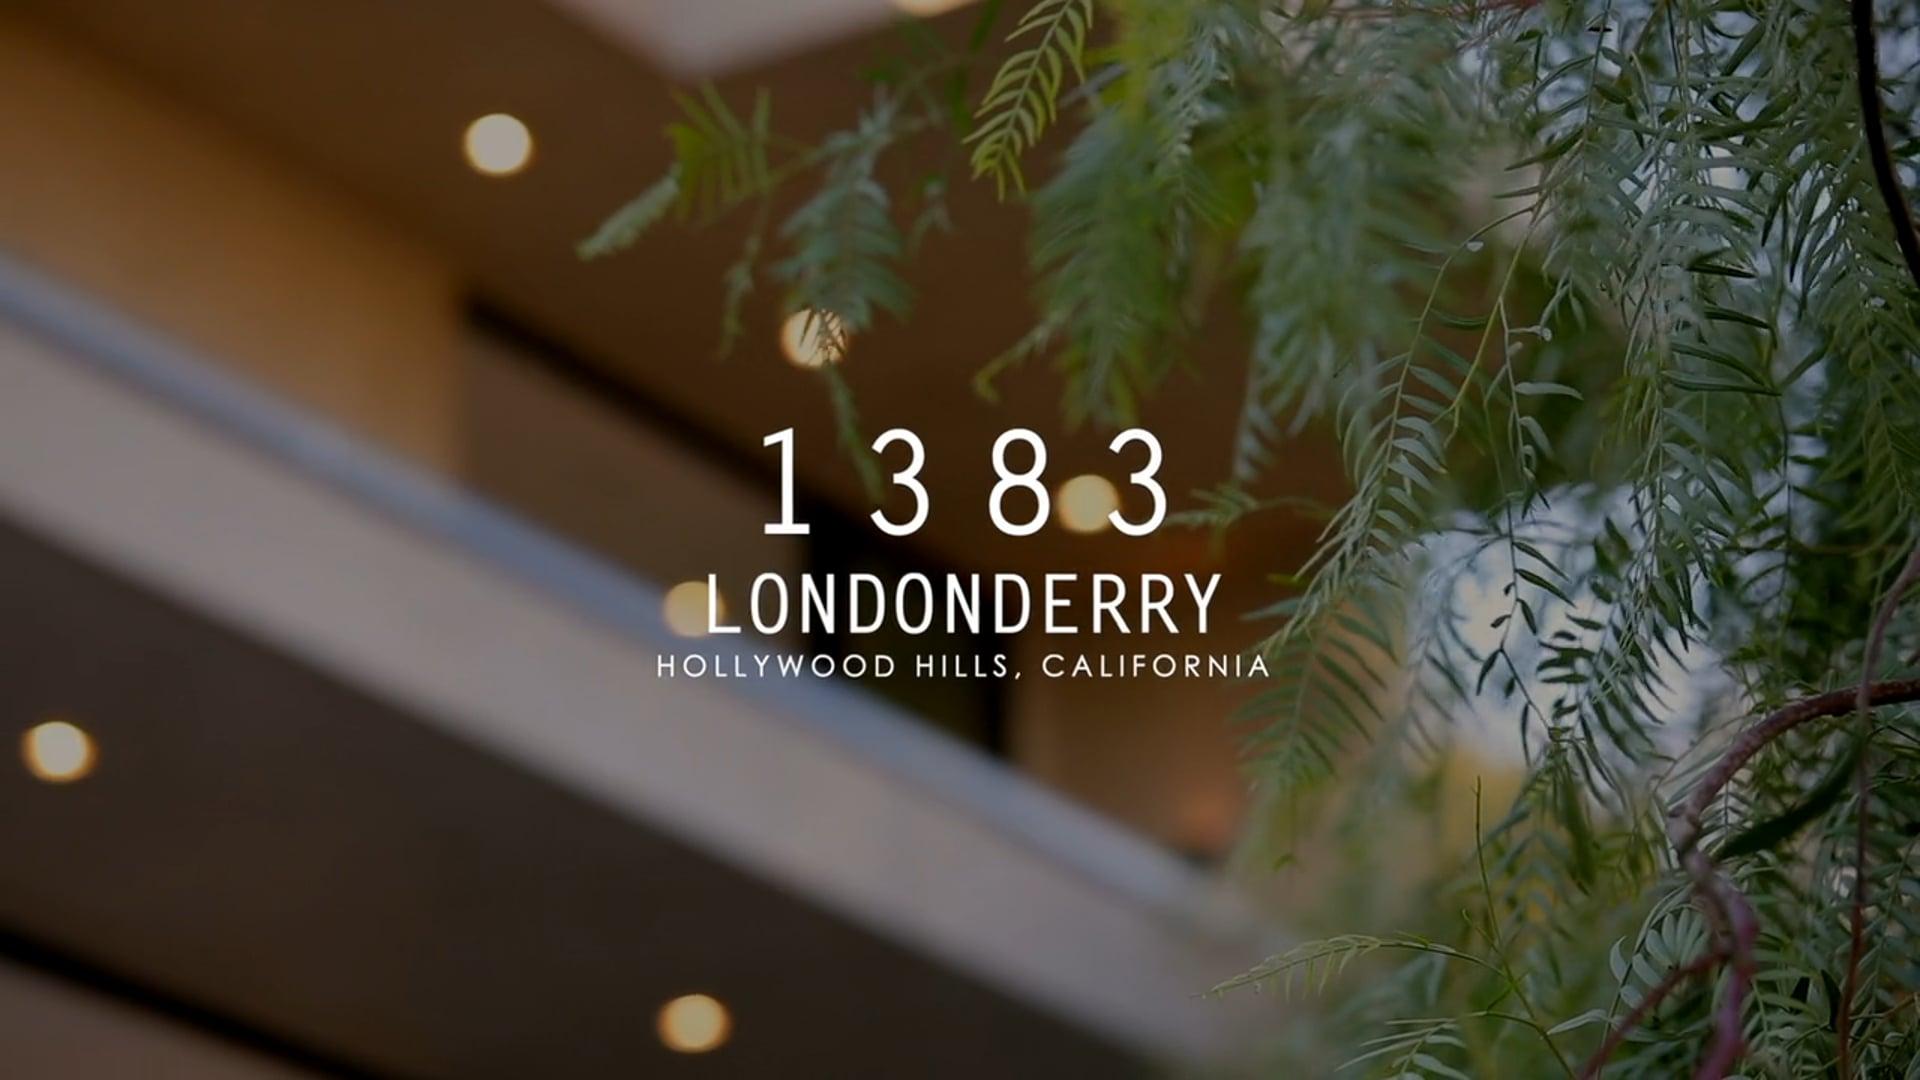 1383 Londonderry, Hollywood Hills CA